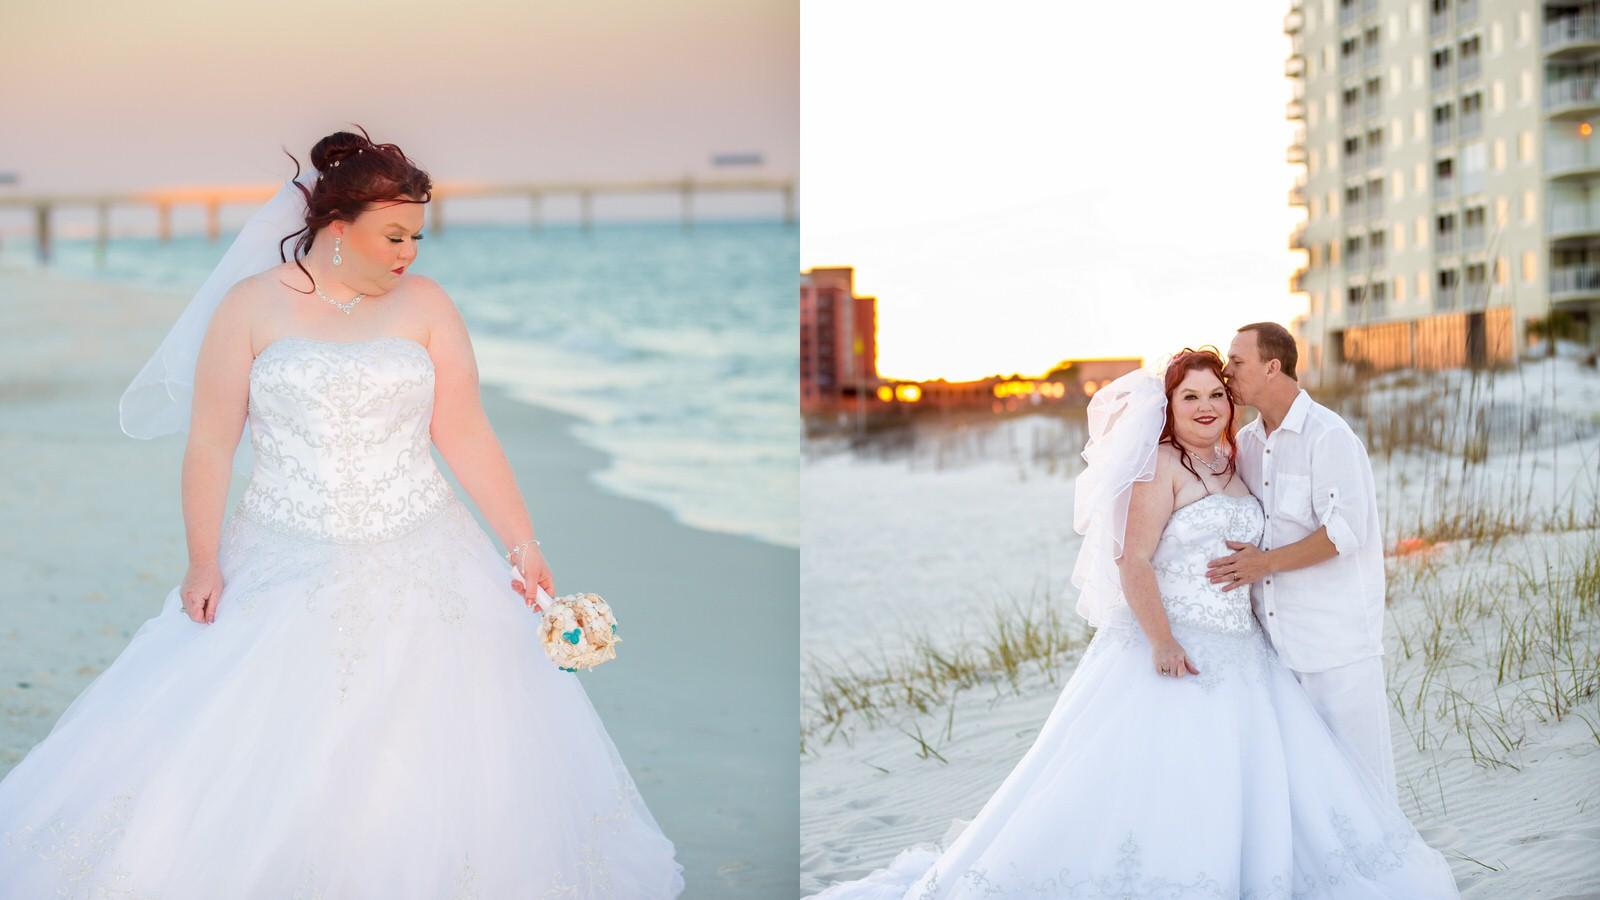 beach bride-1.jpg